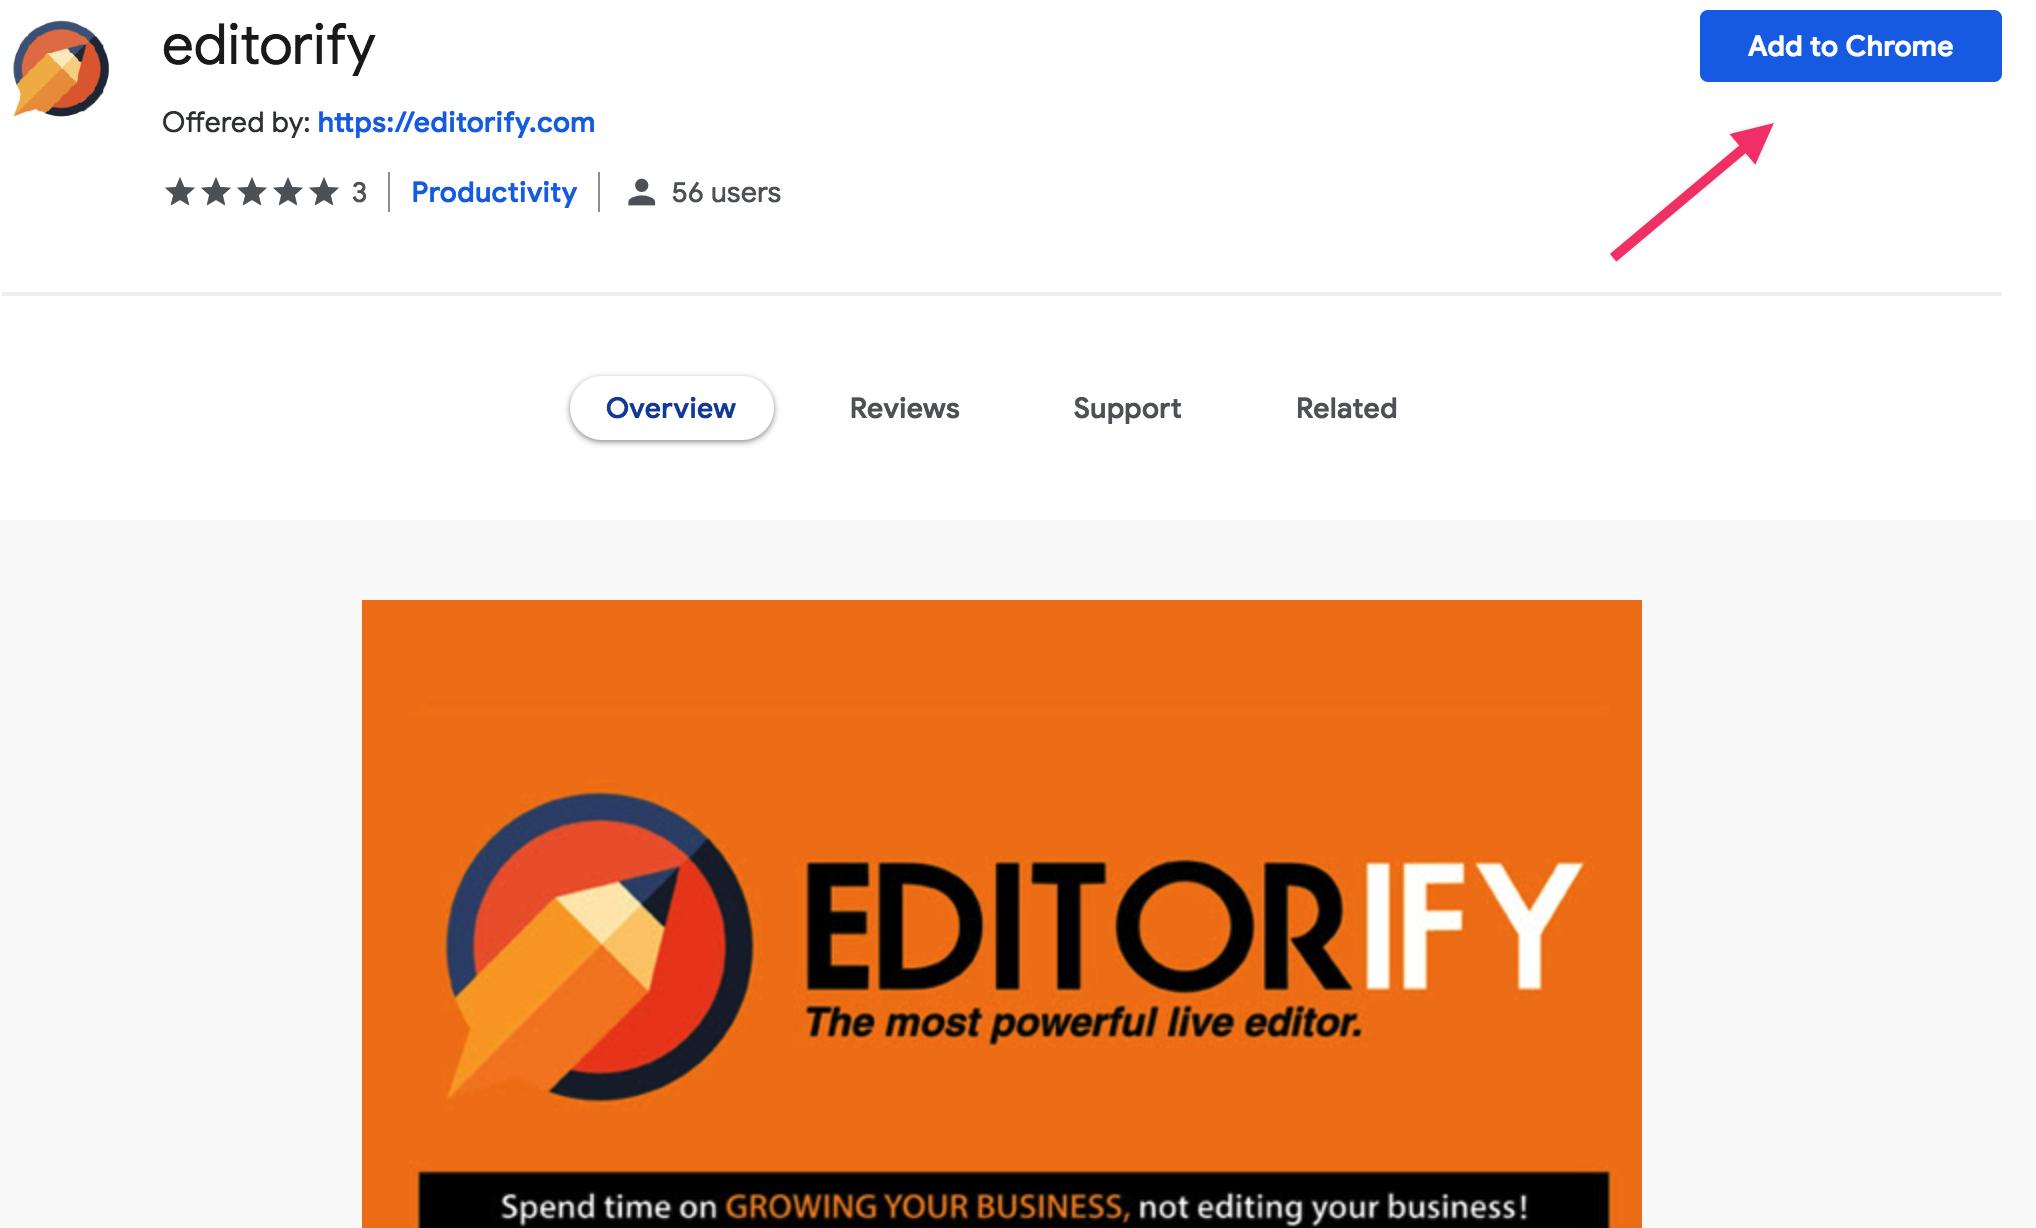 Start Editorify for FREE